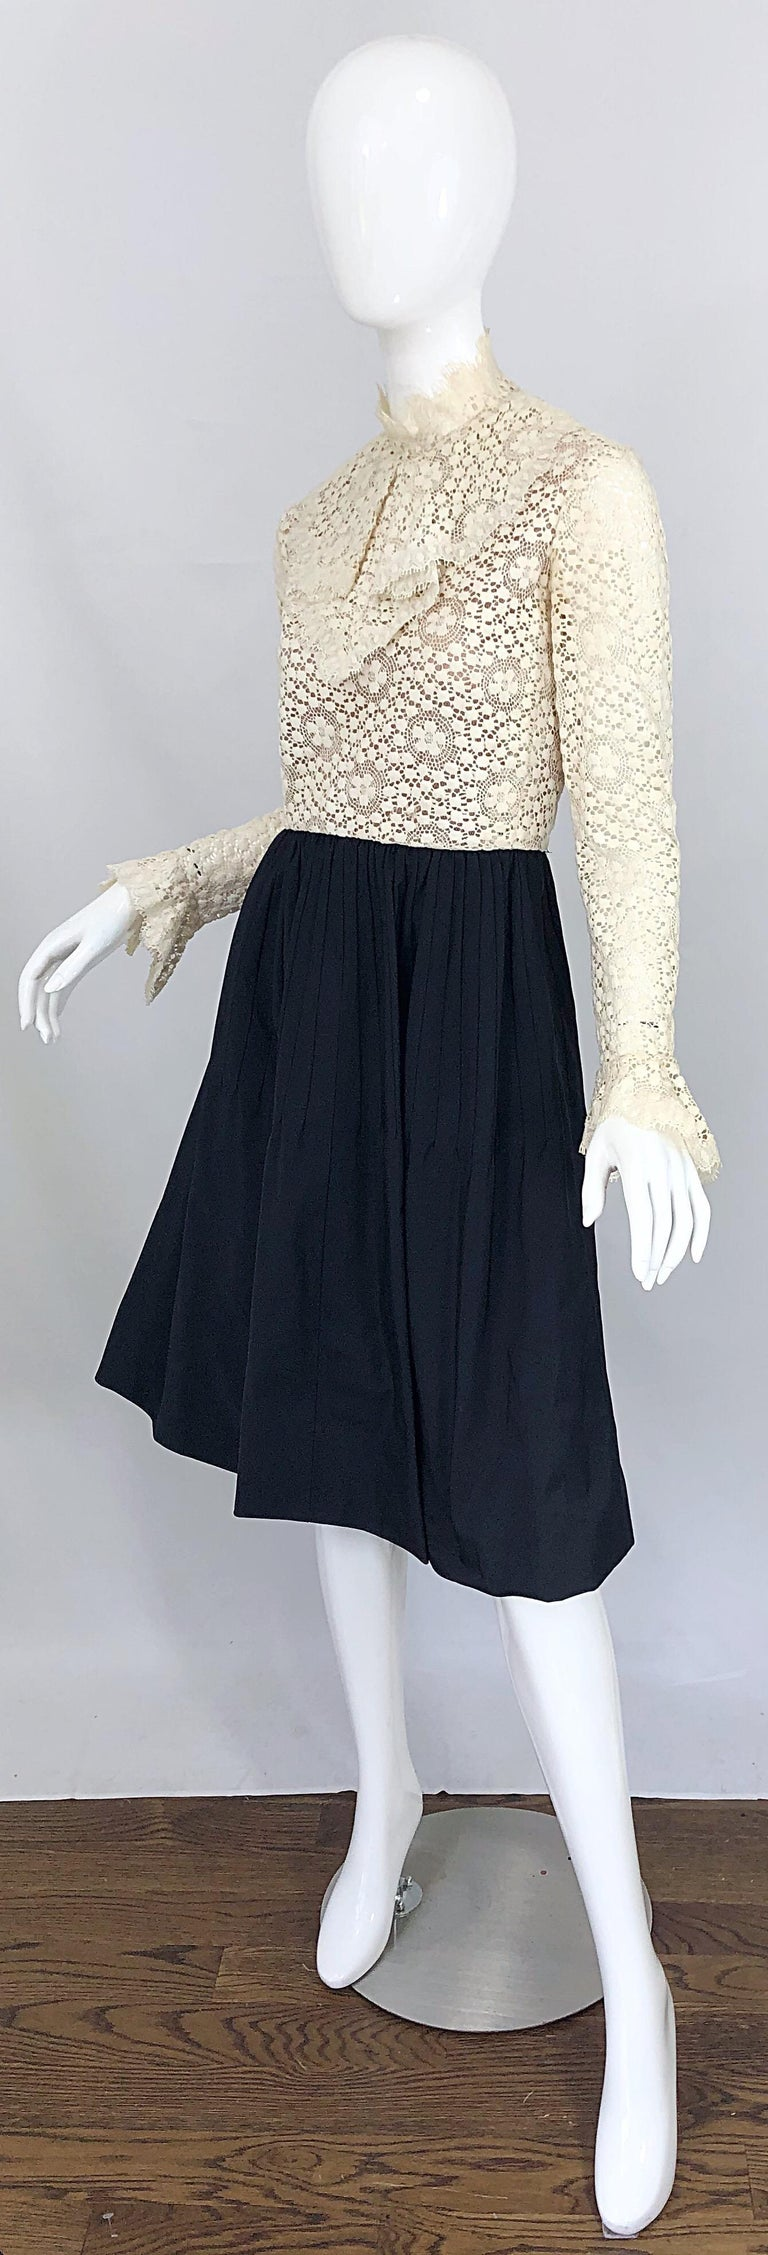 1960s Geoffrey Beene Ivory Crochet and Black Silk Taffeta Vintage 60s Dress For Sale 2